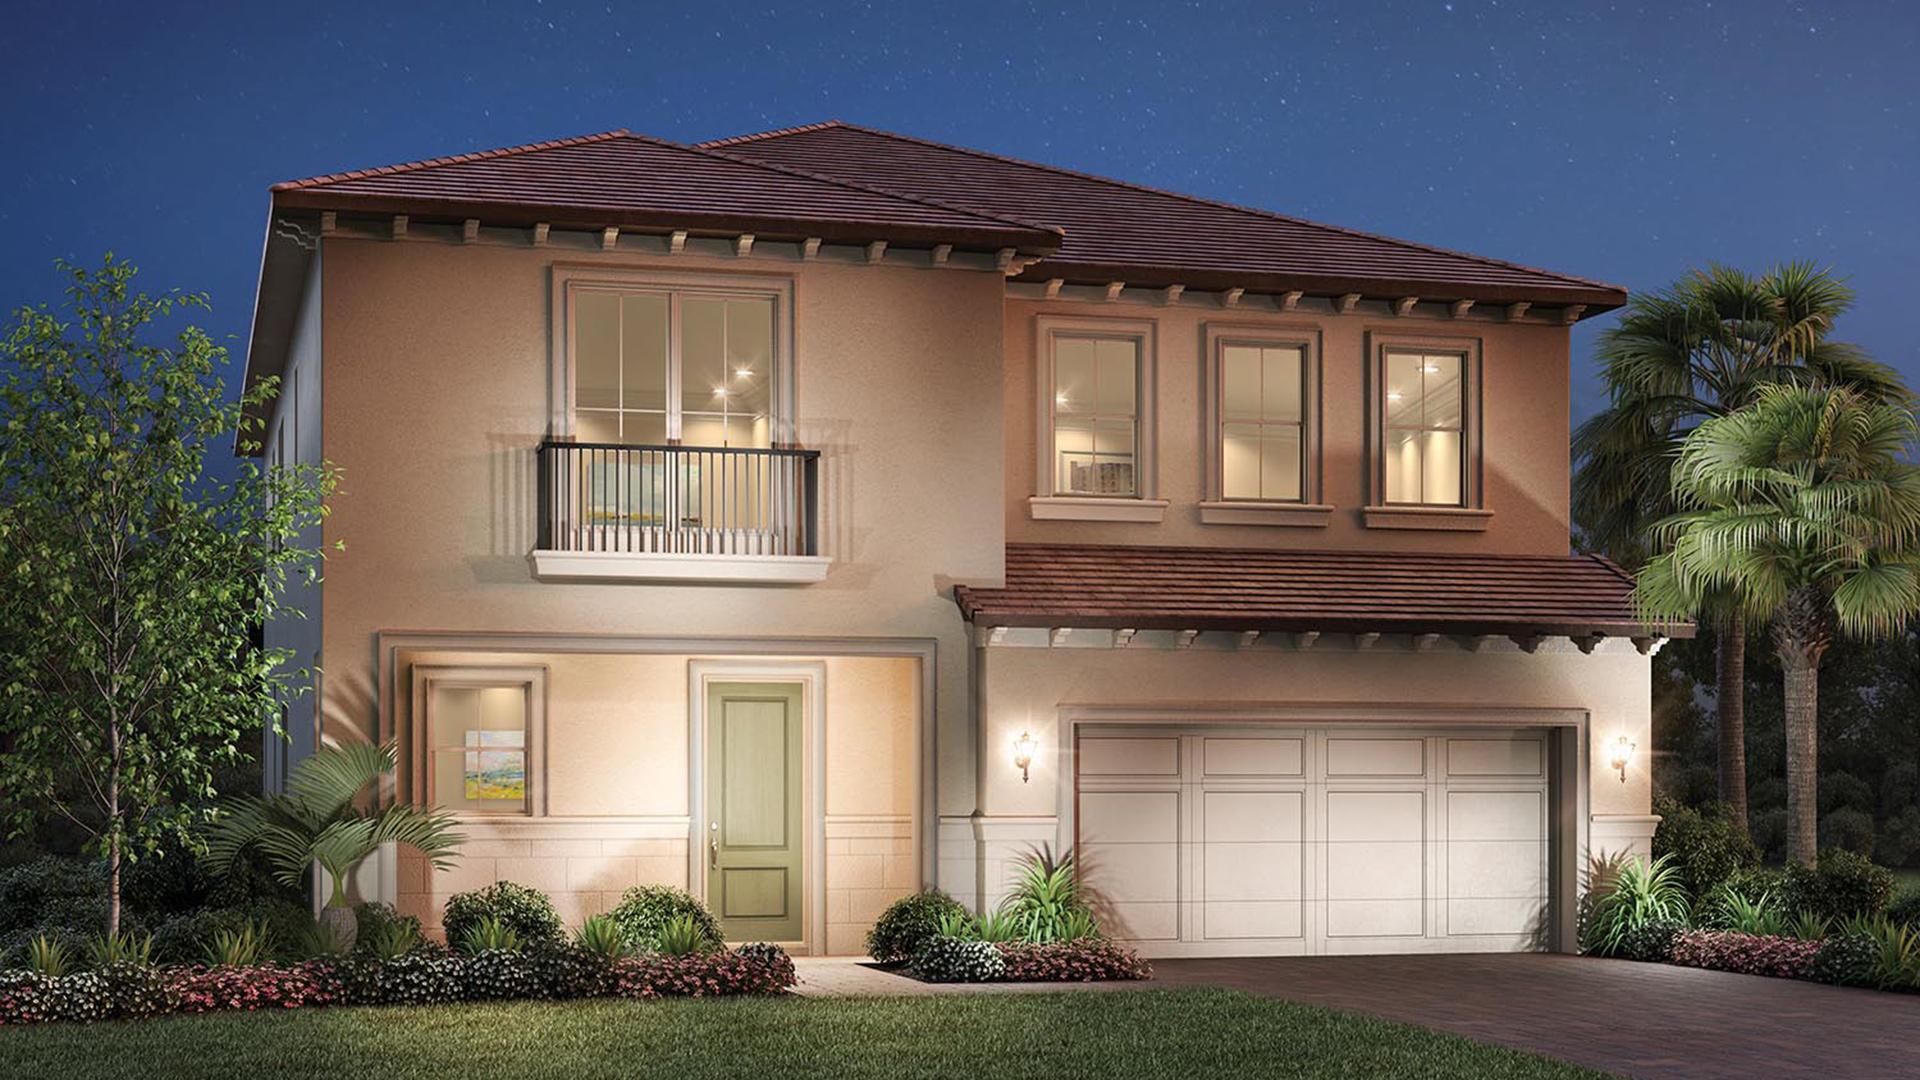 Royal Cypress Preserve | The Arianna Home Design